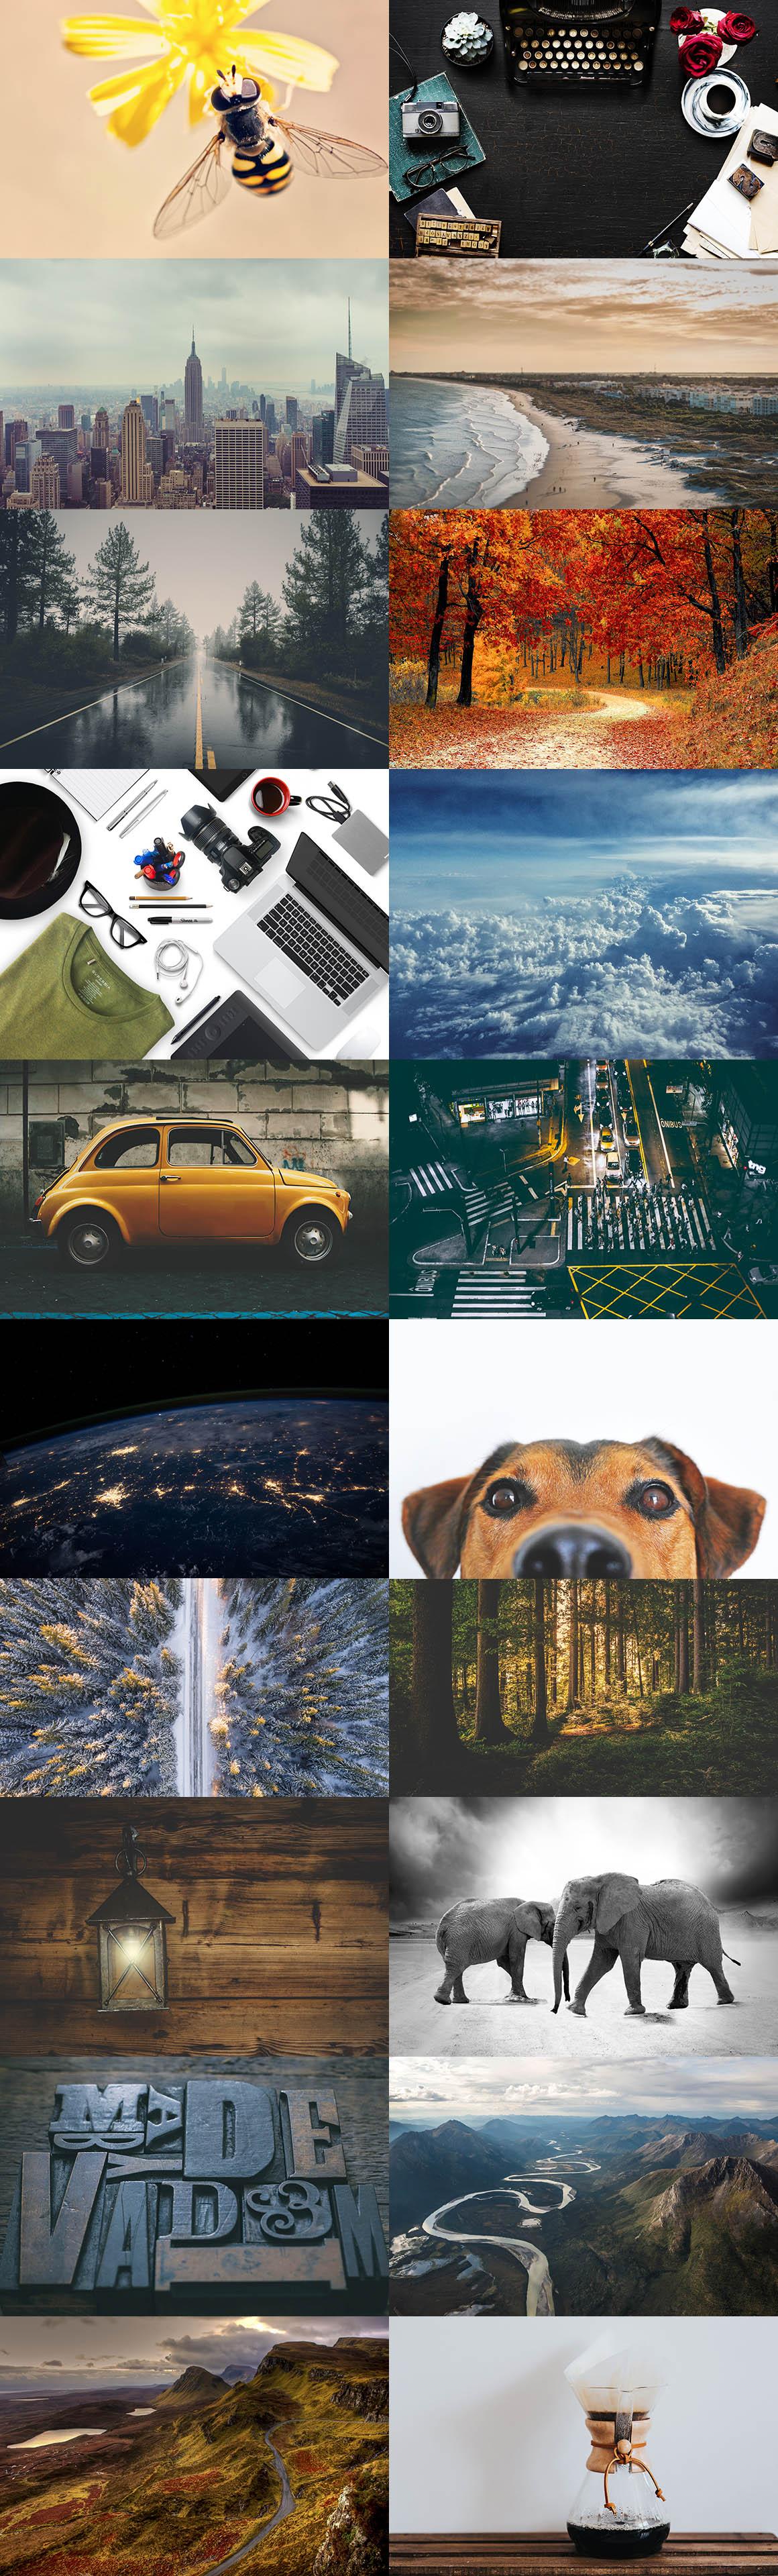 20-free-photos-negativespace-2